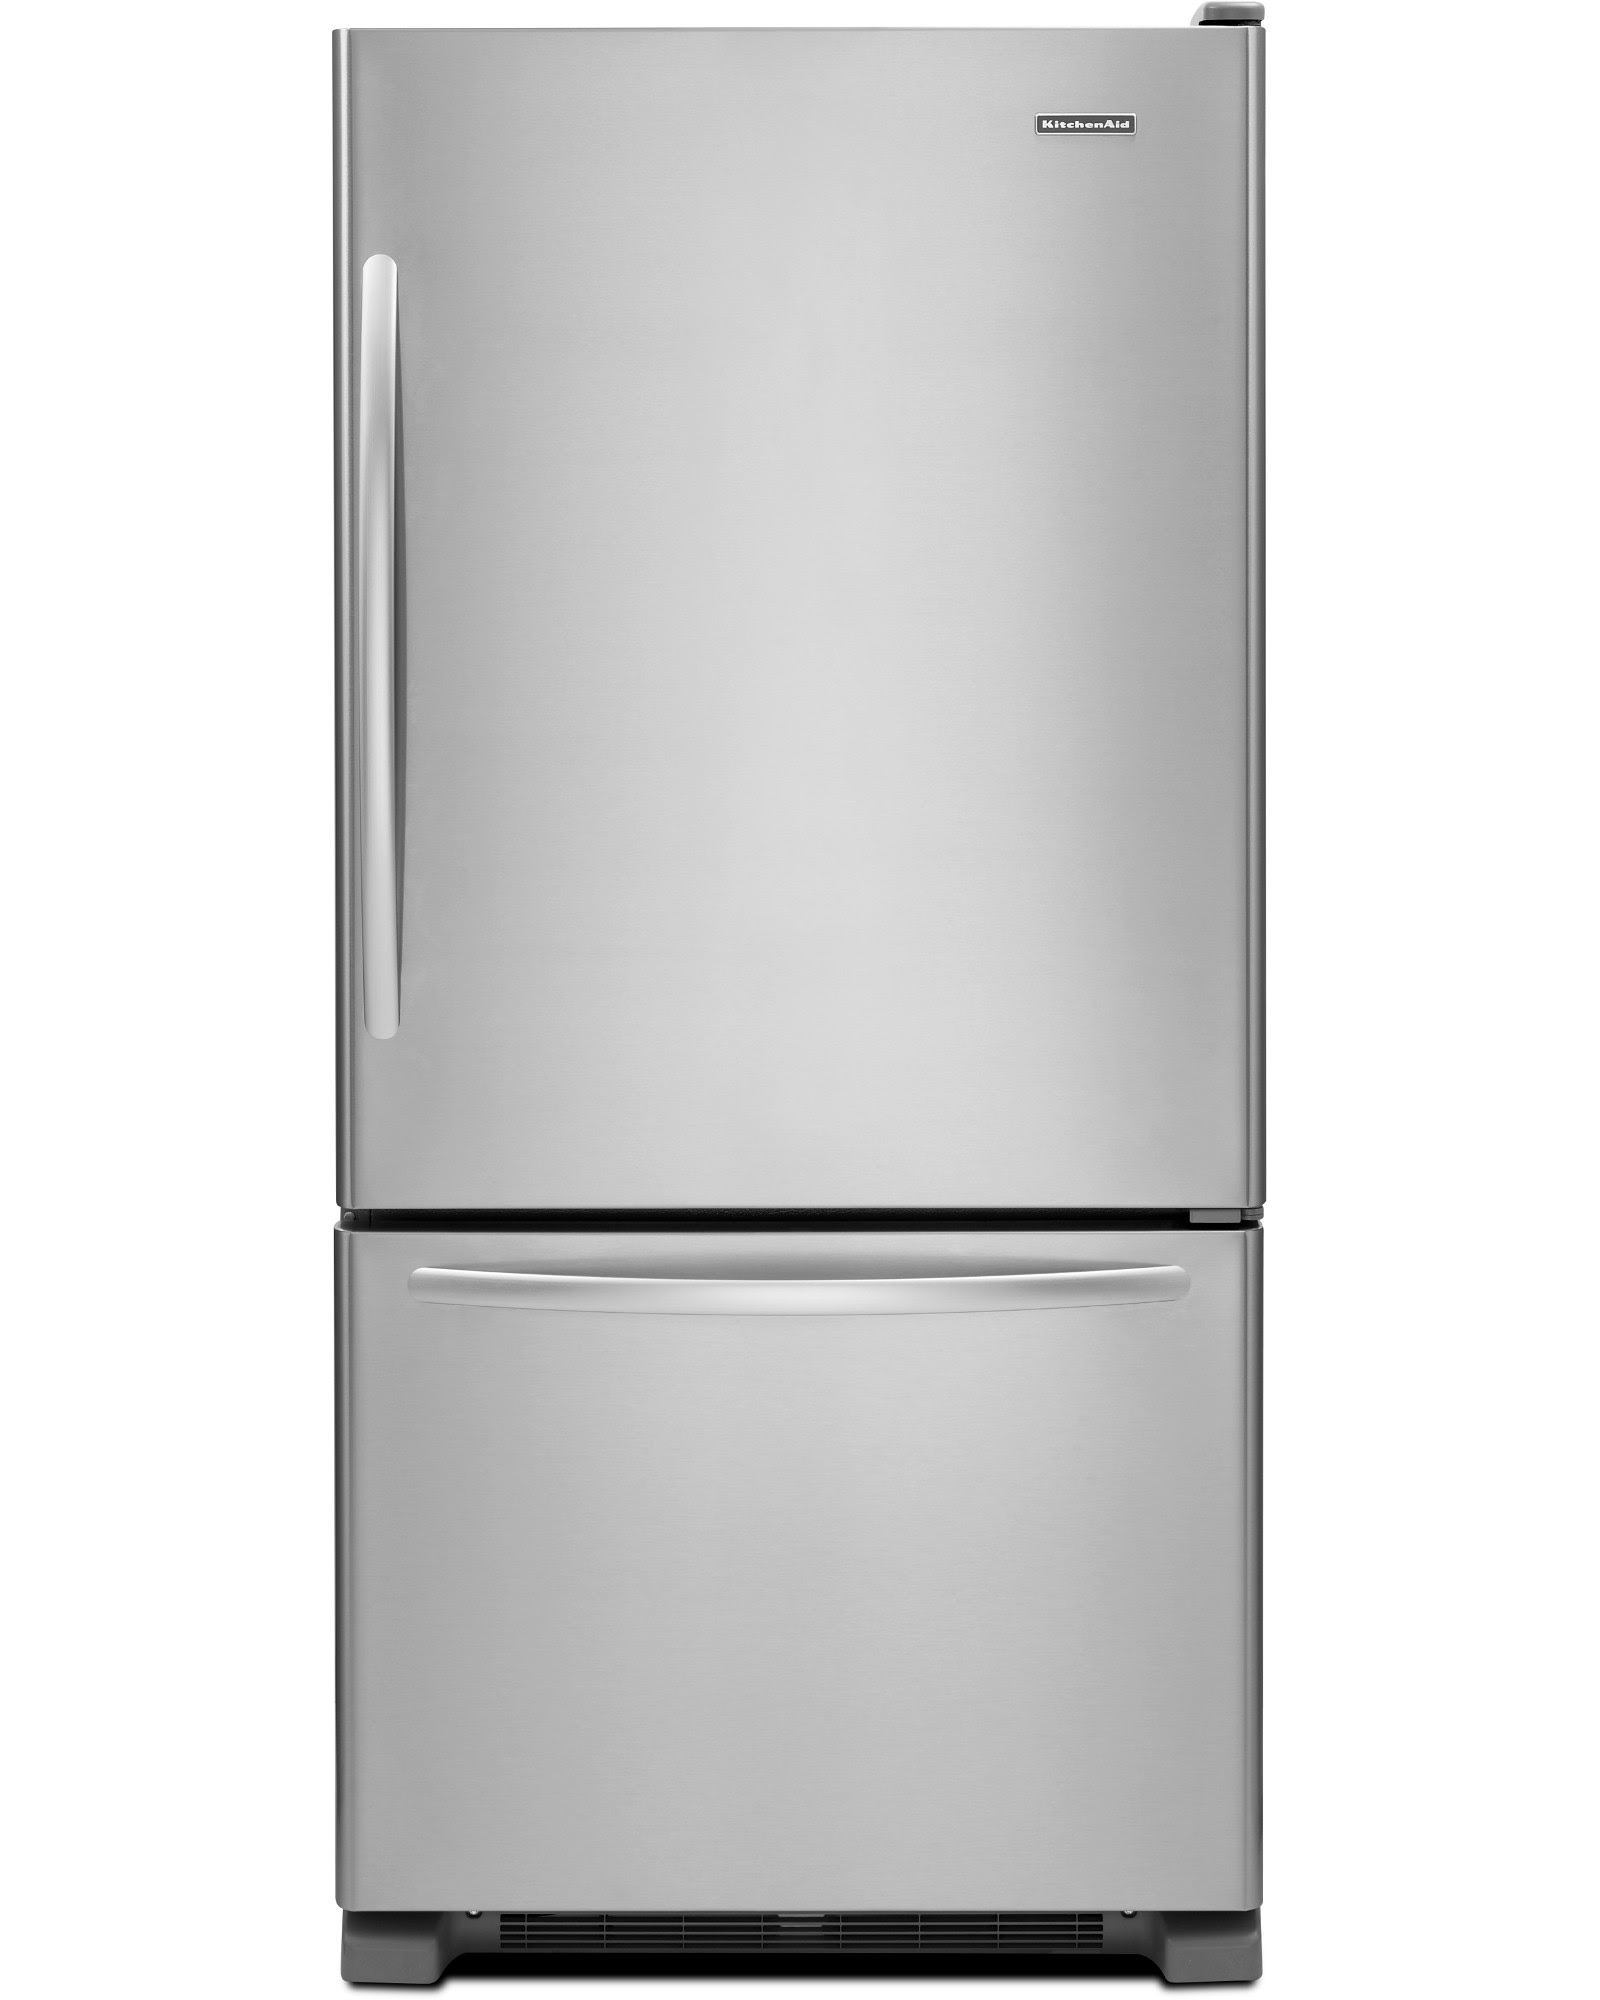 UPC KitchenAid 22 1 cu ft Single Door Bottom